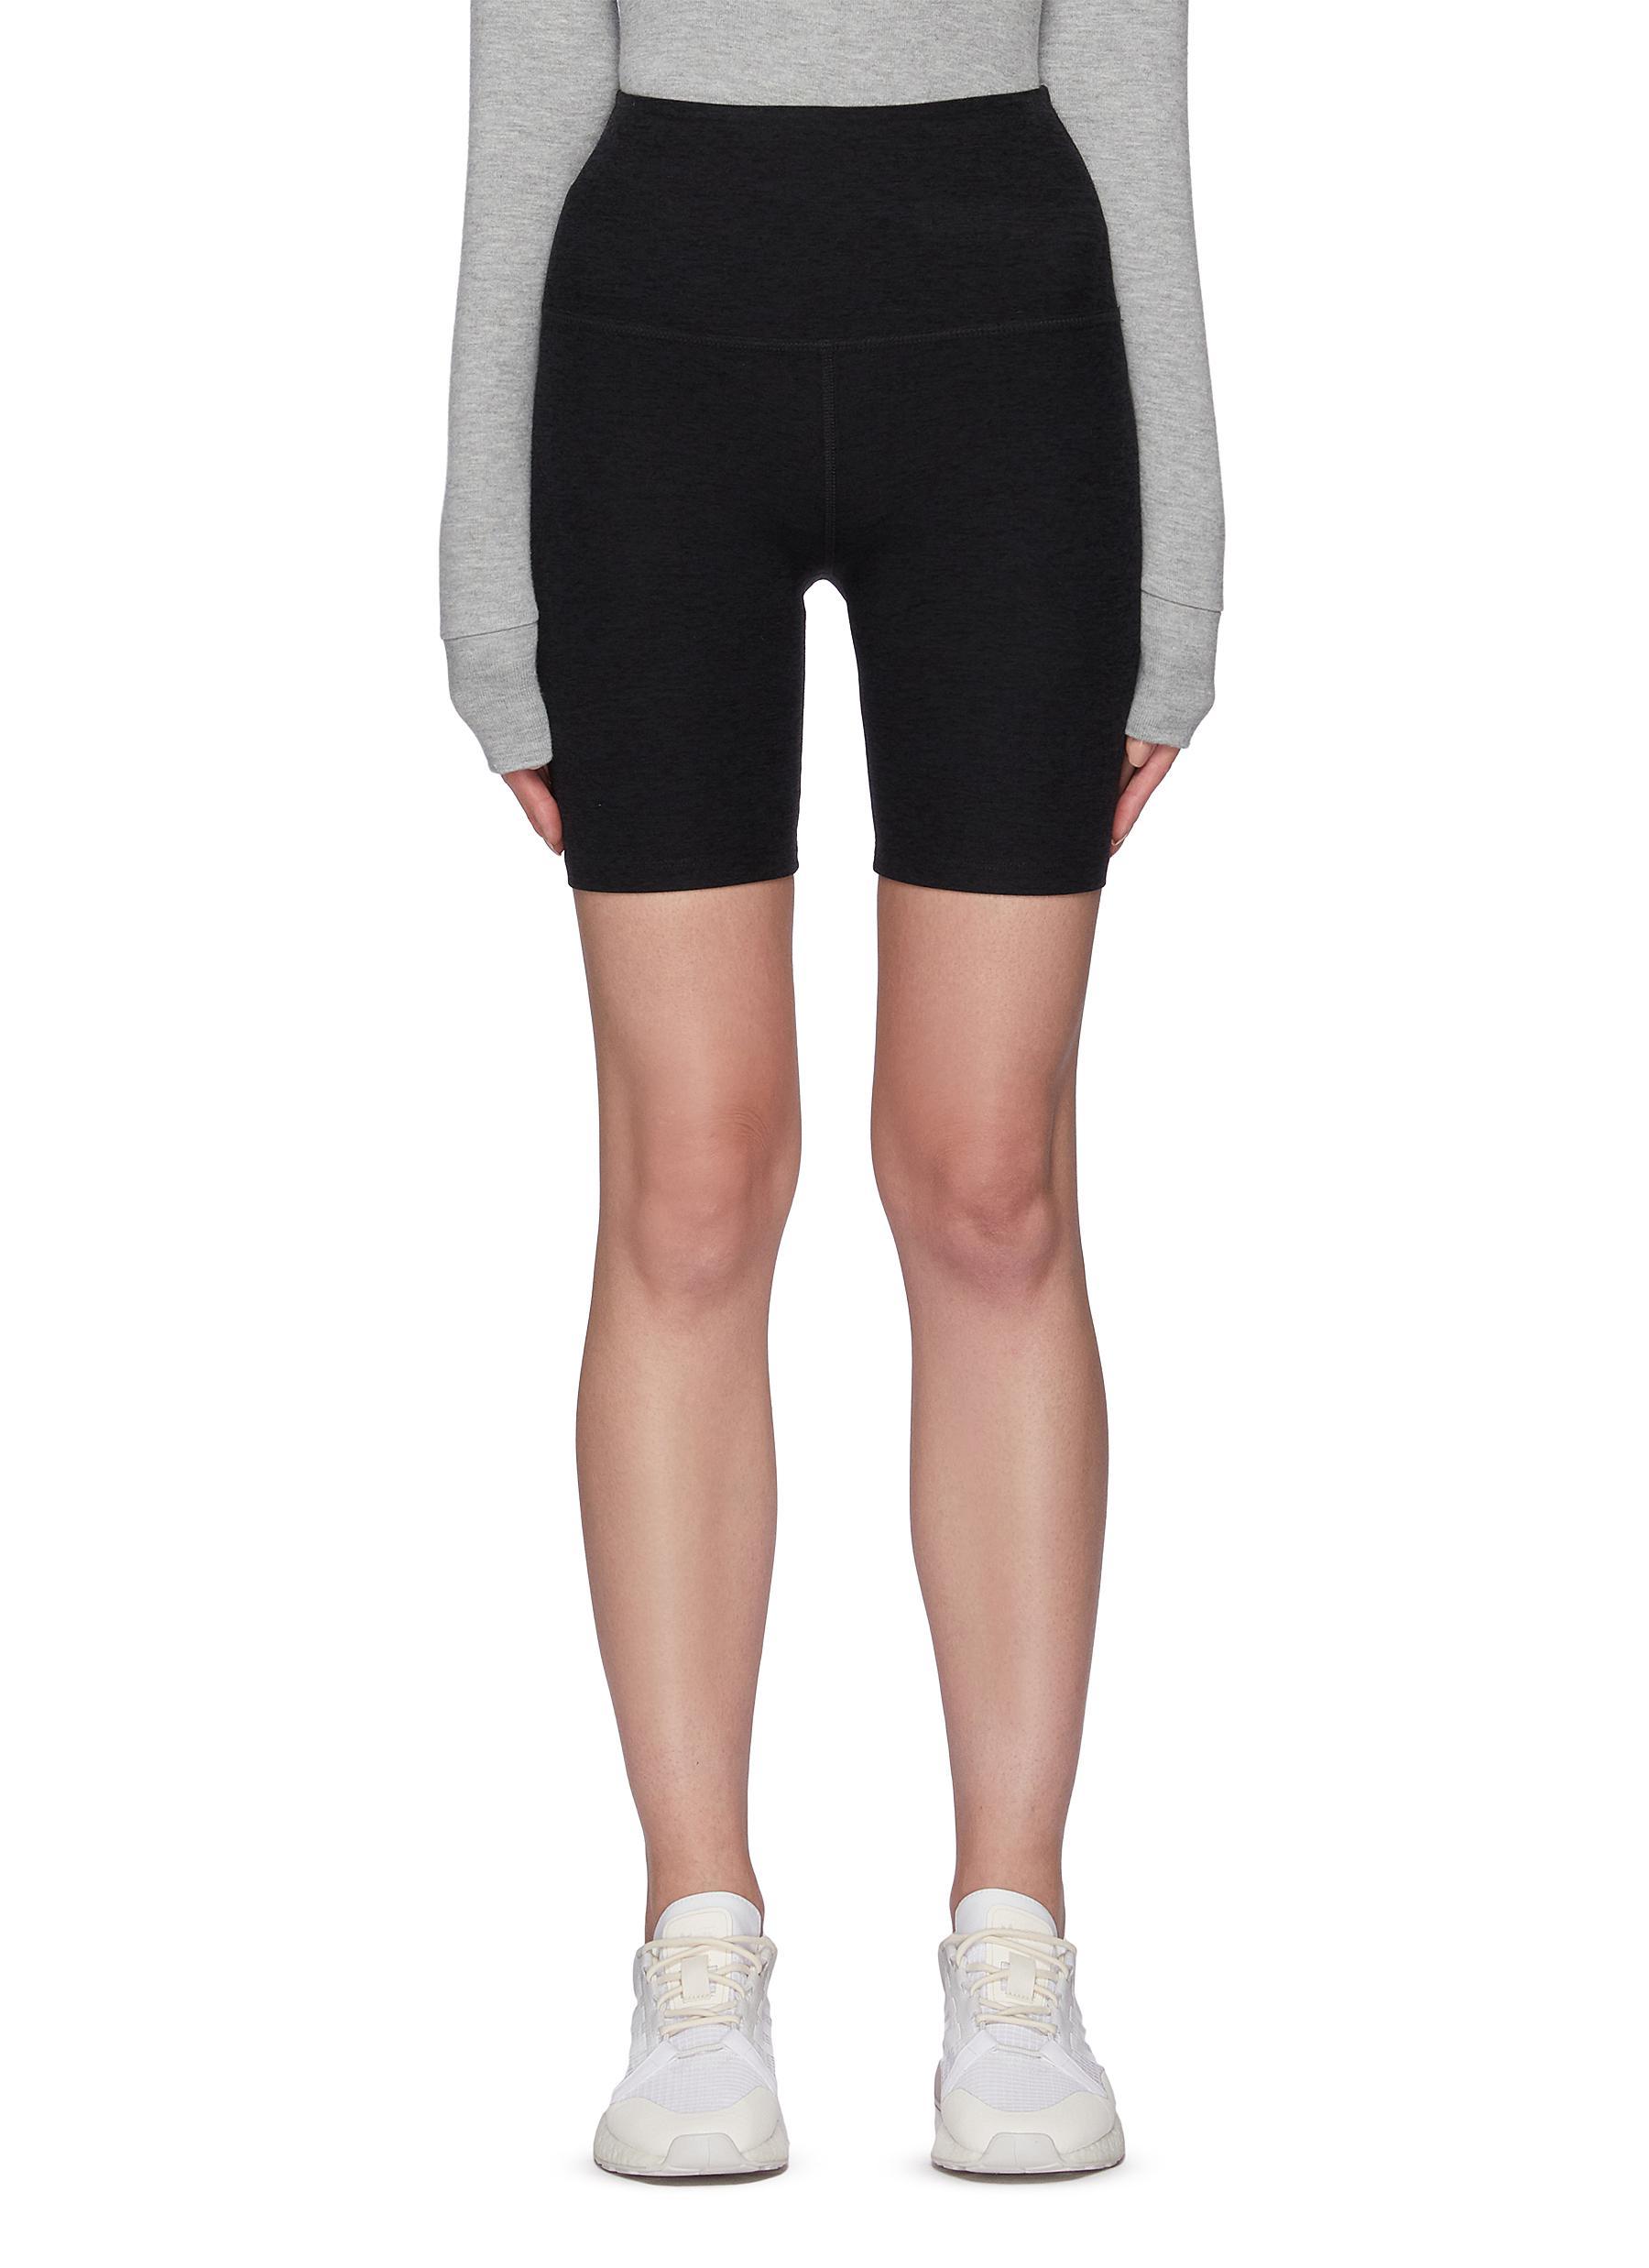 Spacedye High Rise Biker Shorts